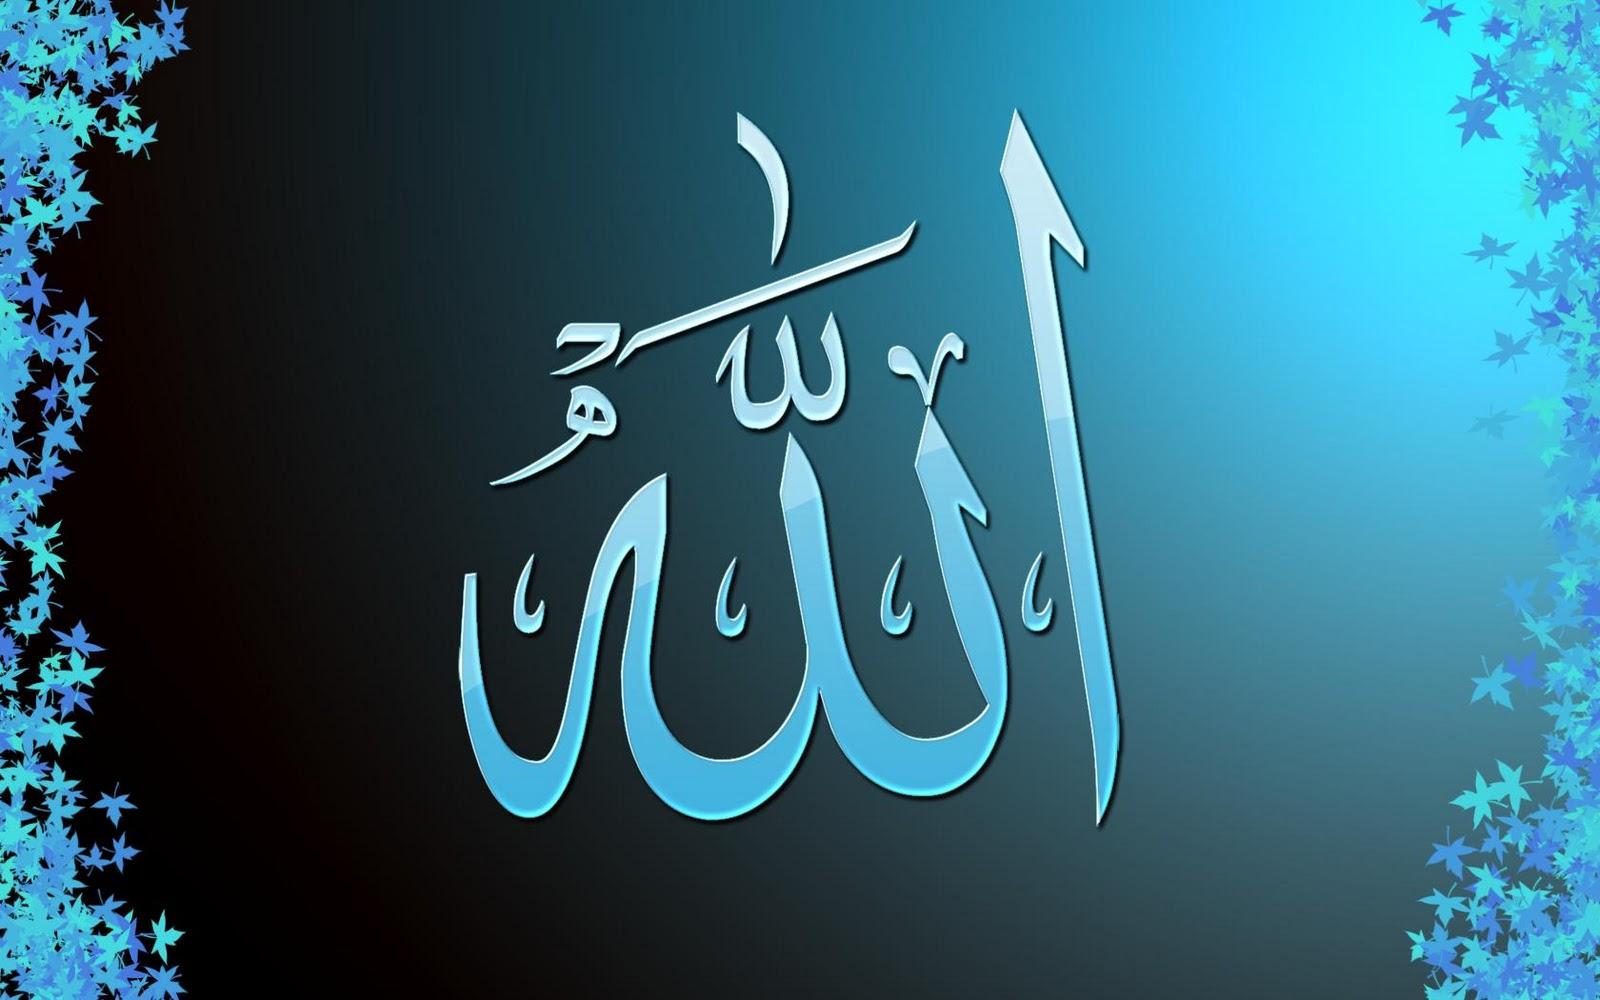 http://4.bp.blogspot.com/_sRGU_JXOz6E/TRTcRInEesI/AAAAAAAAATs/ay0UFs9y8IM/s1600/Allah%2BWallpaper.jpg